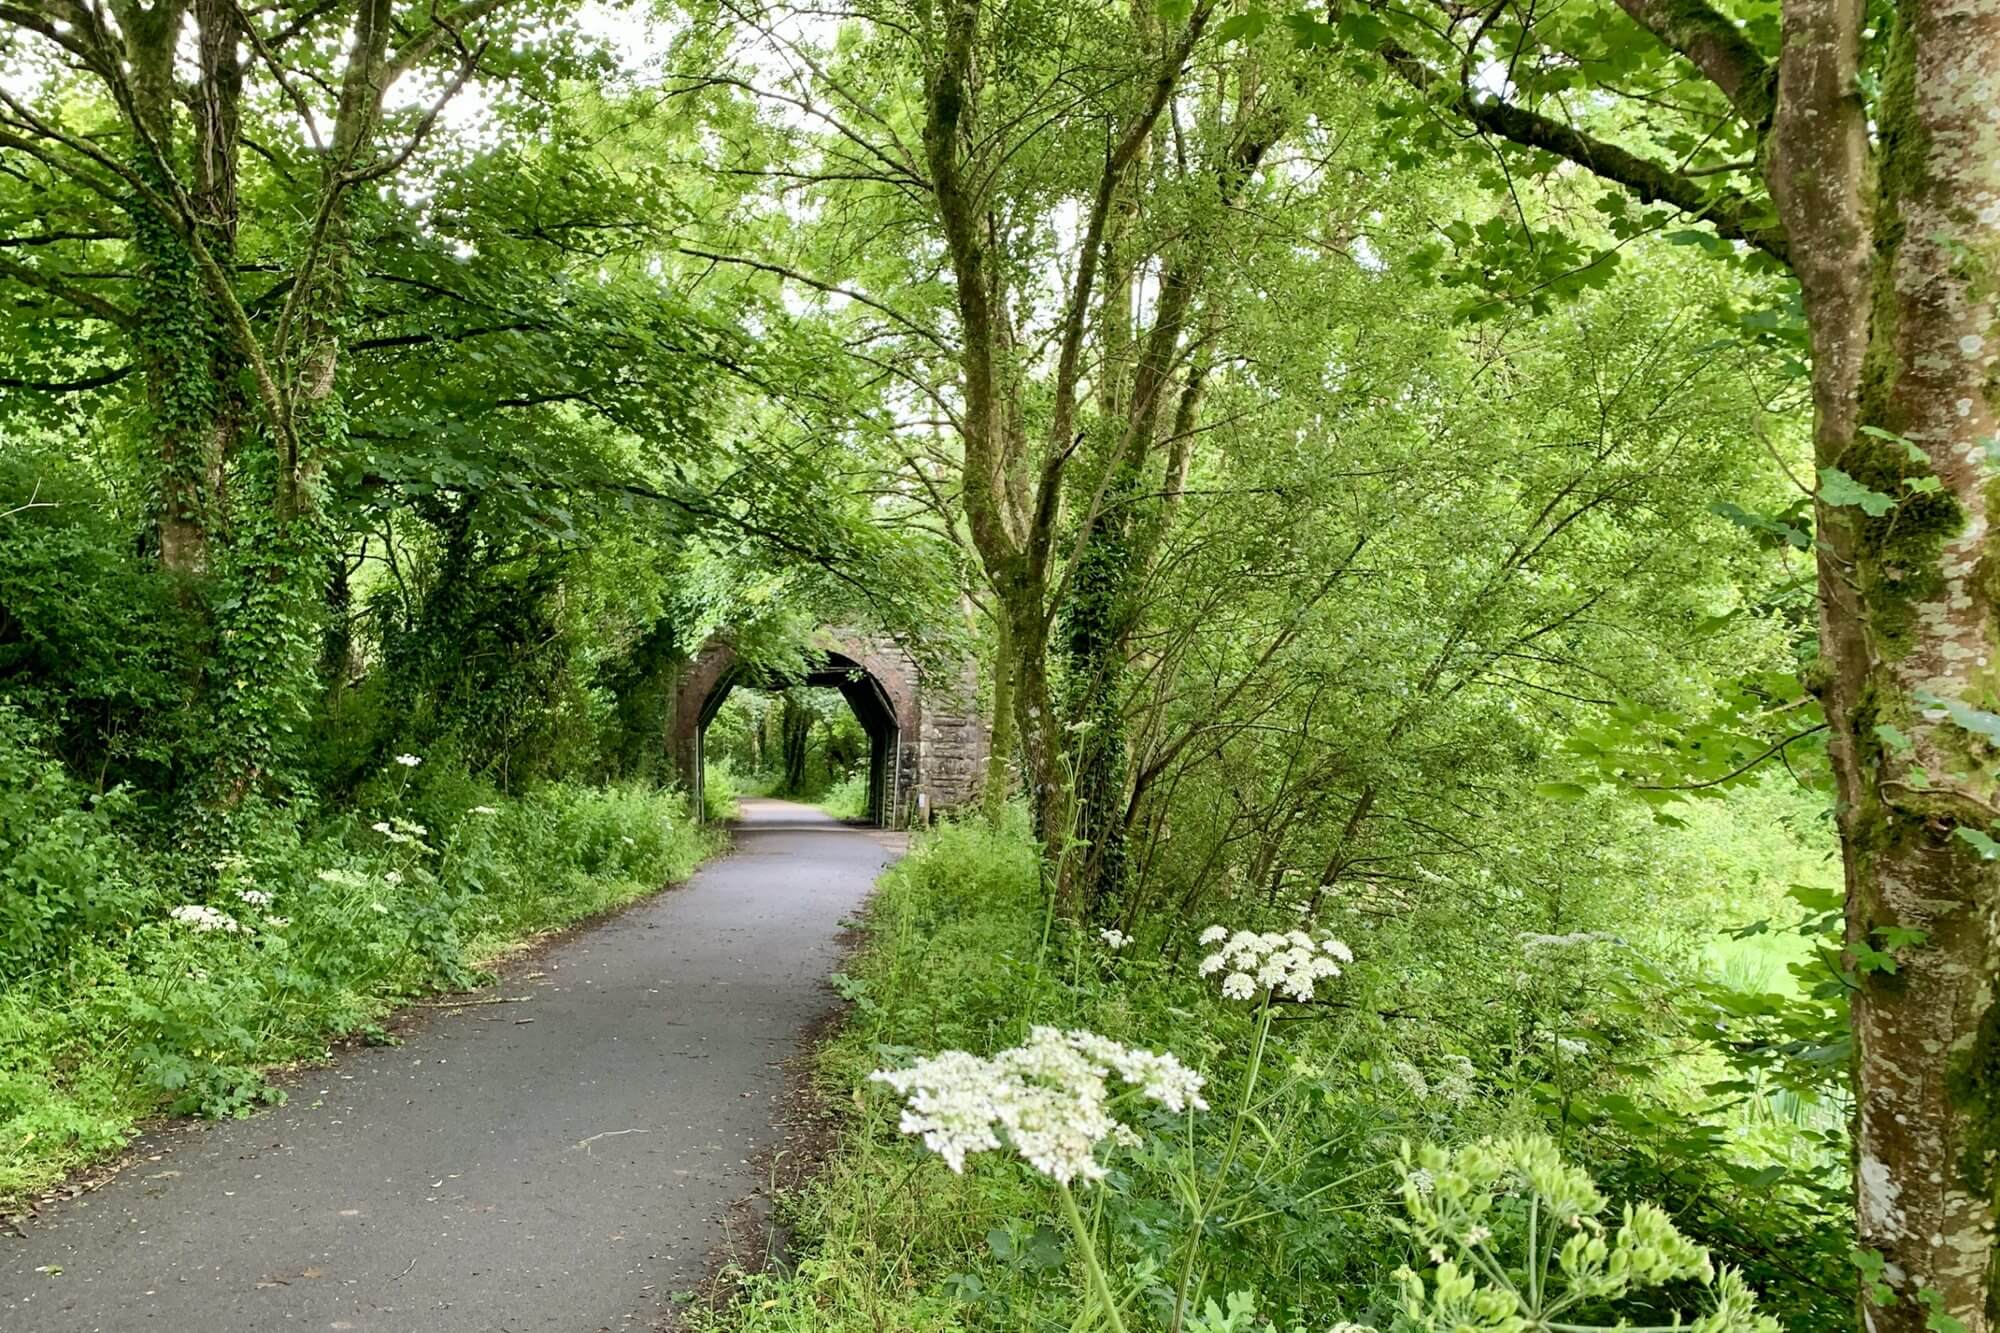 Wadebridge to Grogley Halt